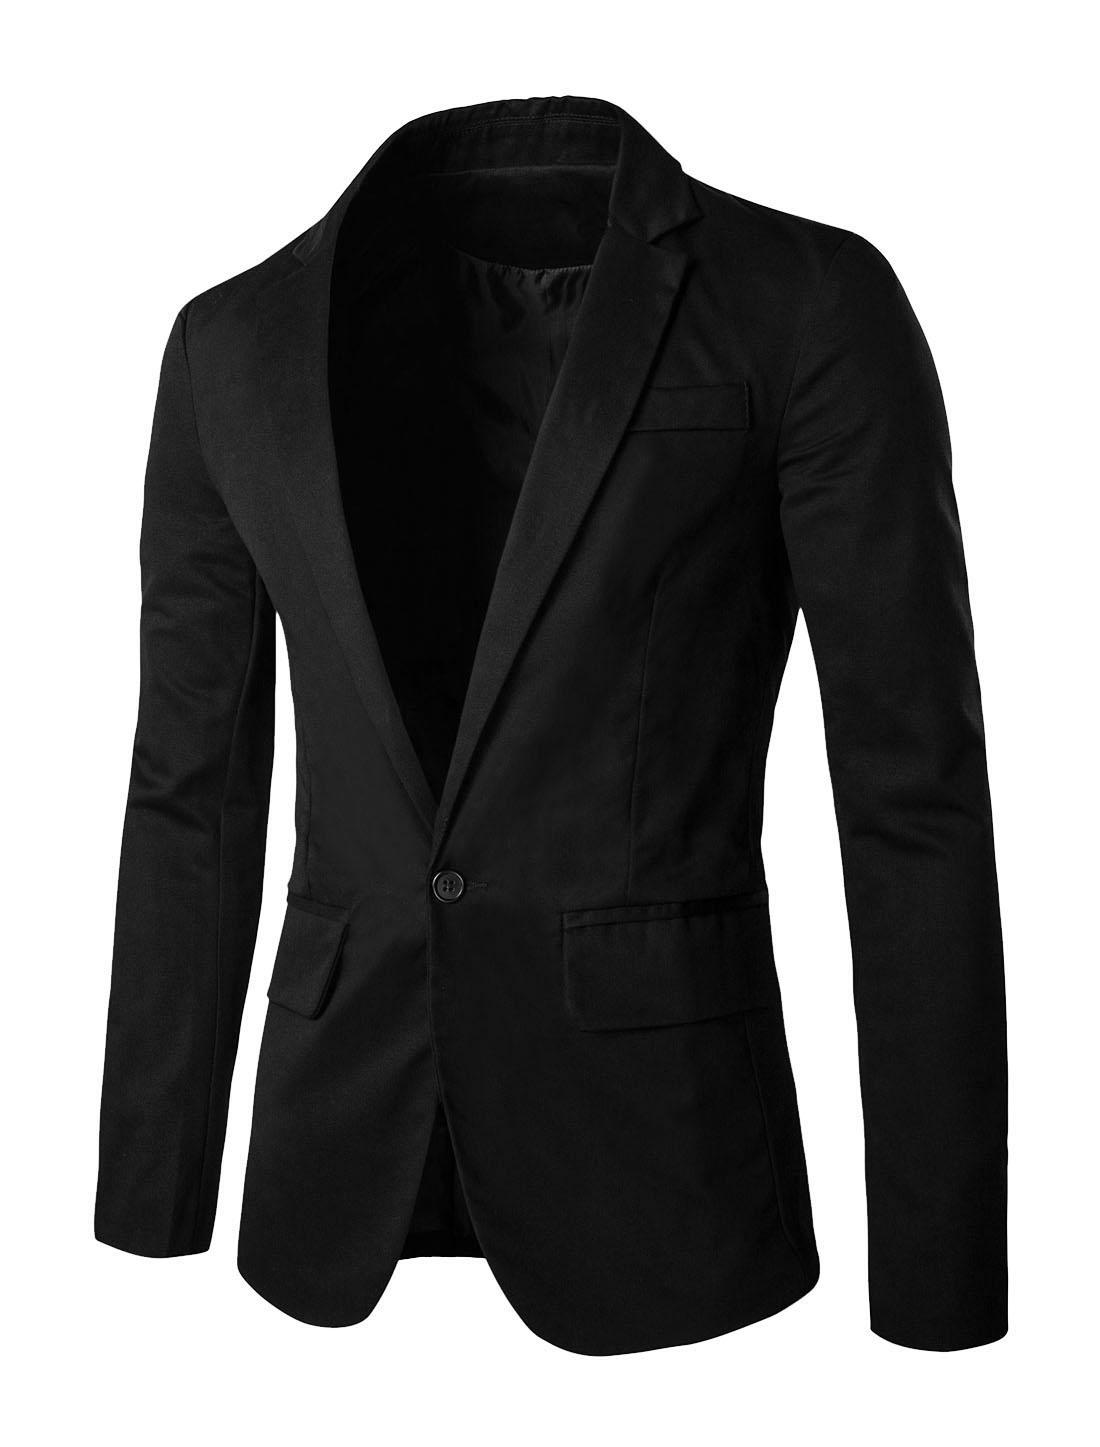 Men One Button Closure Long Sleeves Cotton Casual Blazer Black S